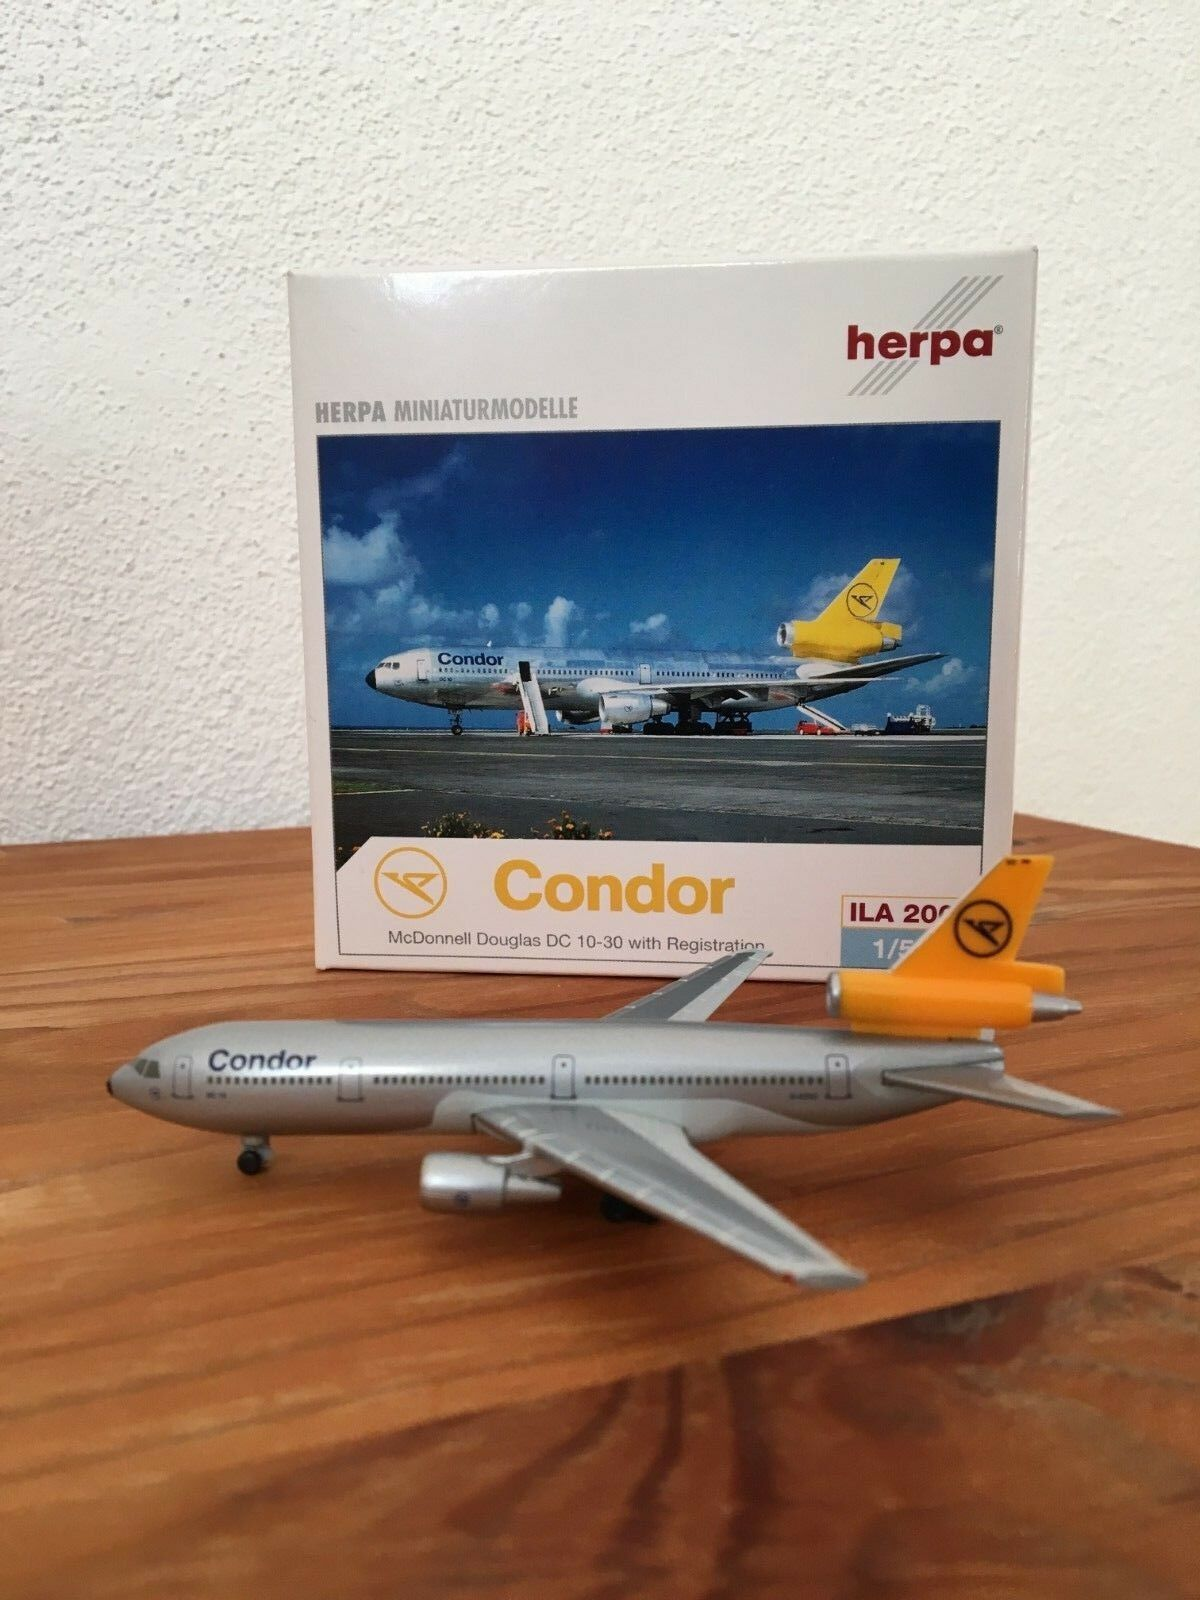 Herpa Herpa Herpa Wings McDonnell Douglas DC-10 Condor  ILA 2002  Club Edition    Limited c5808e